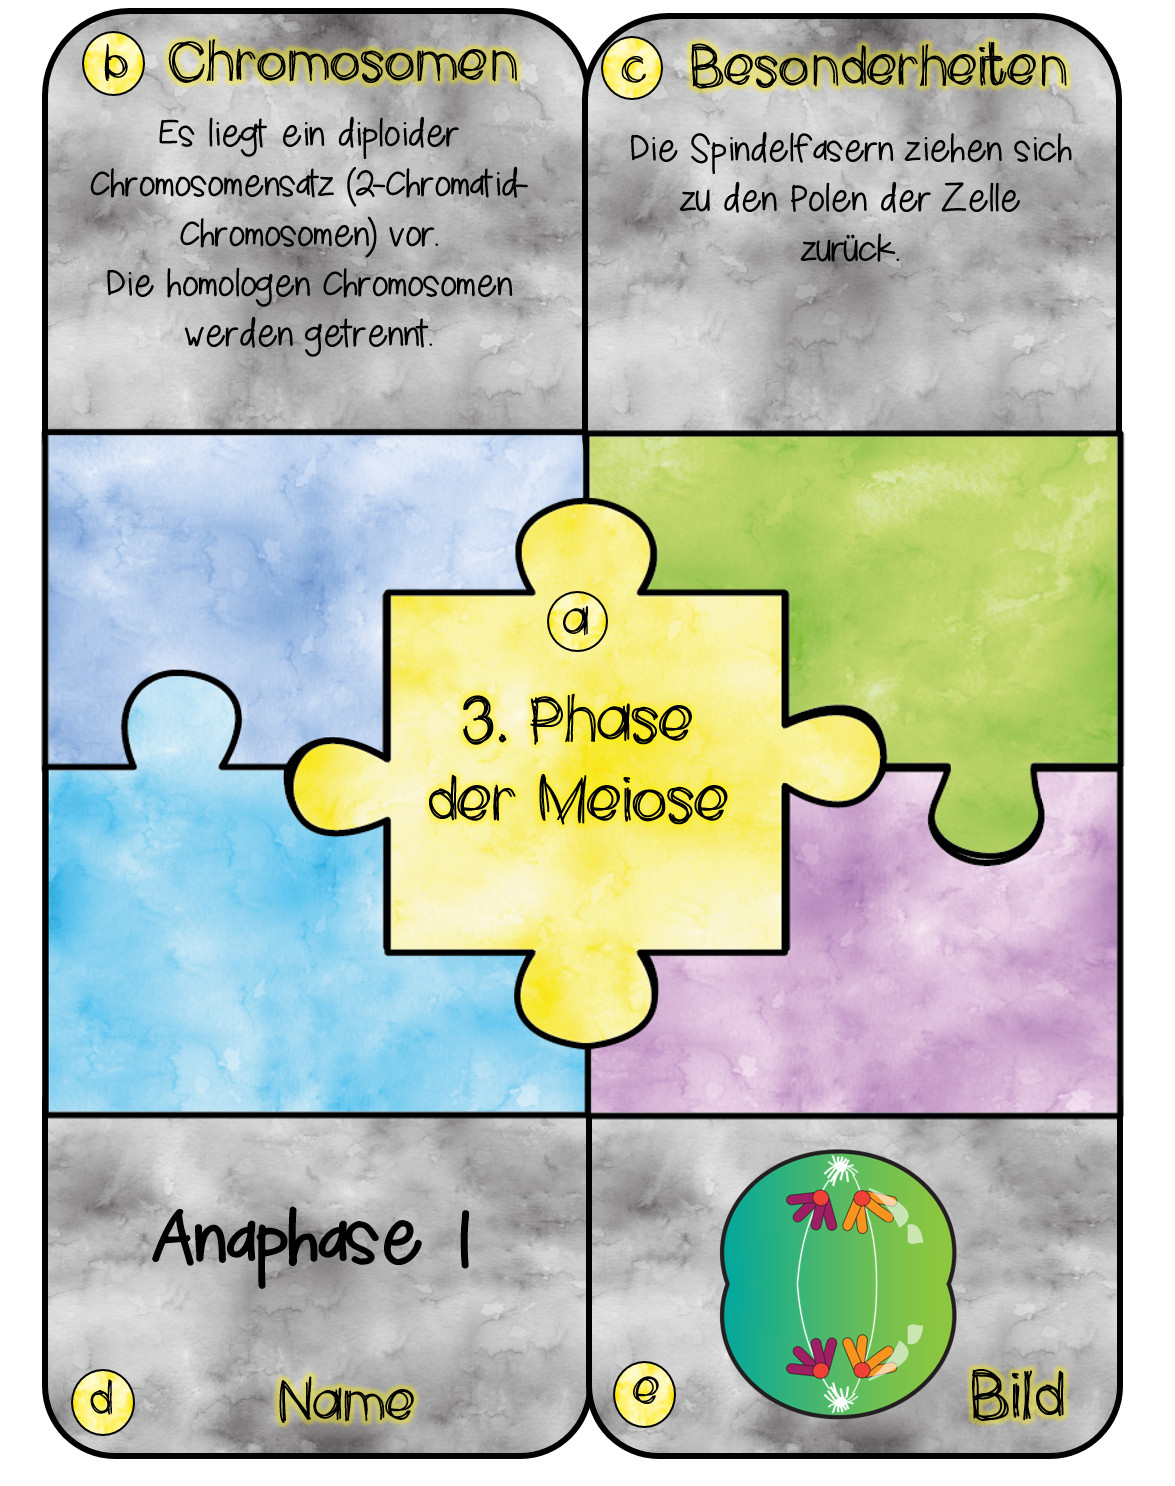 Anaphase 1 komplett